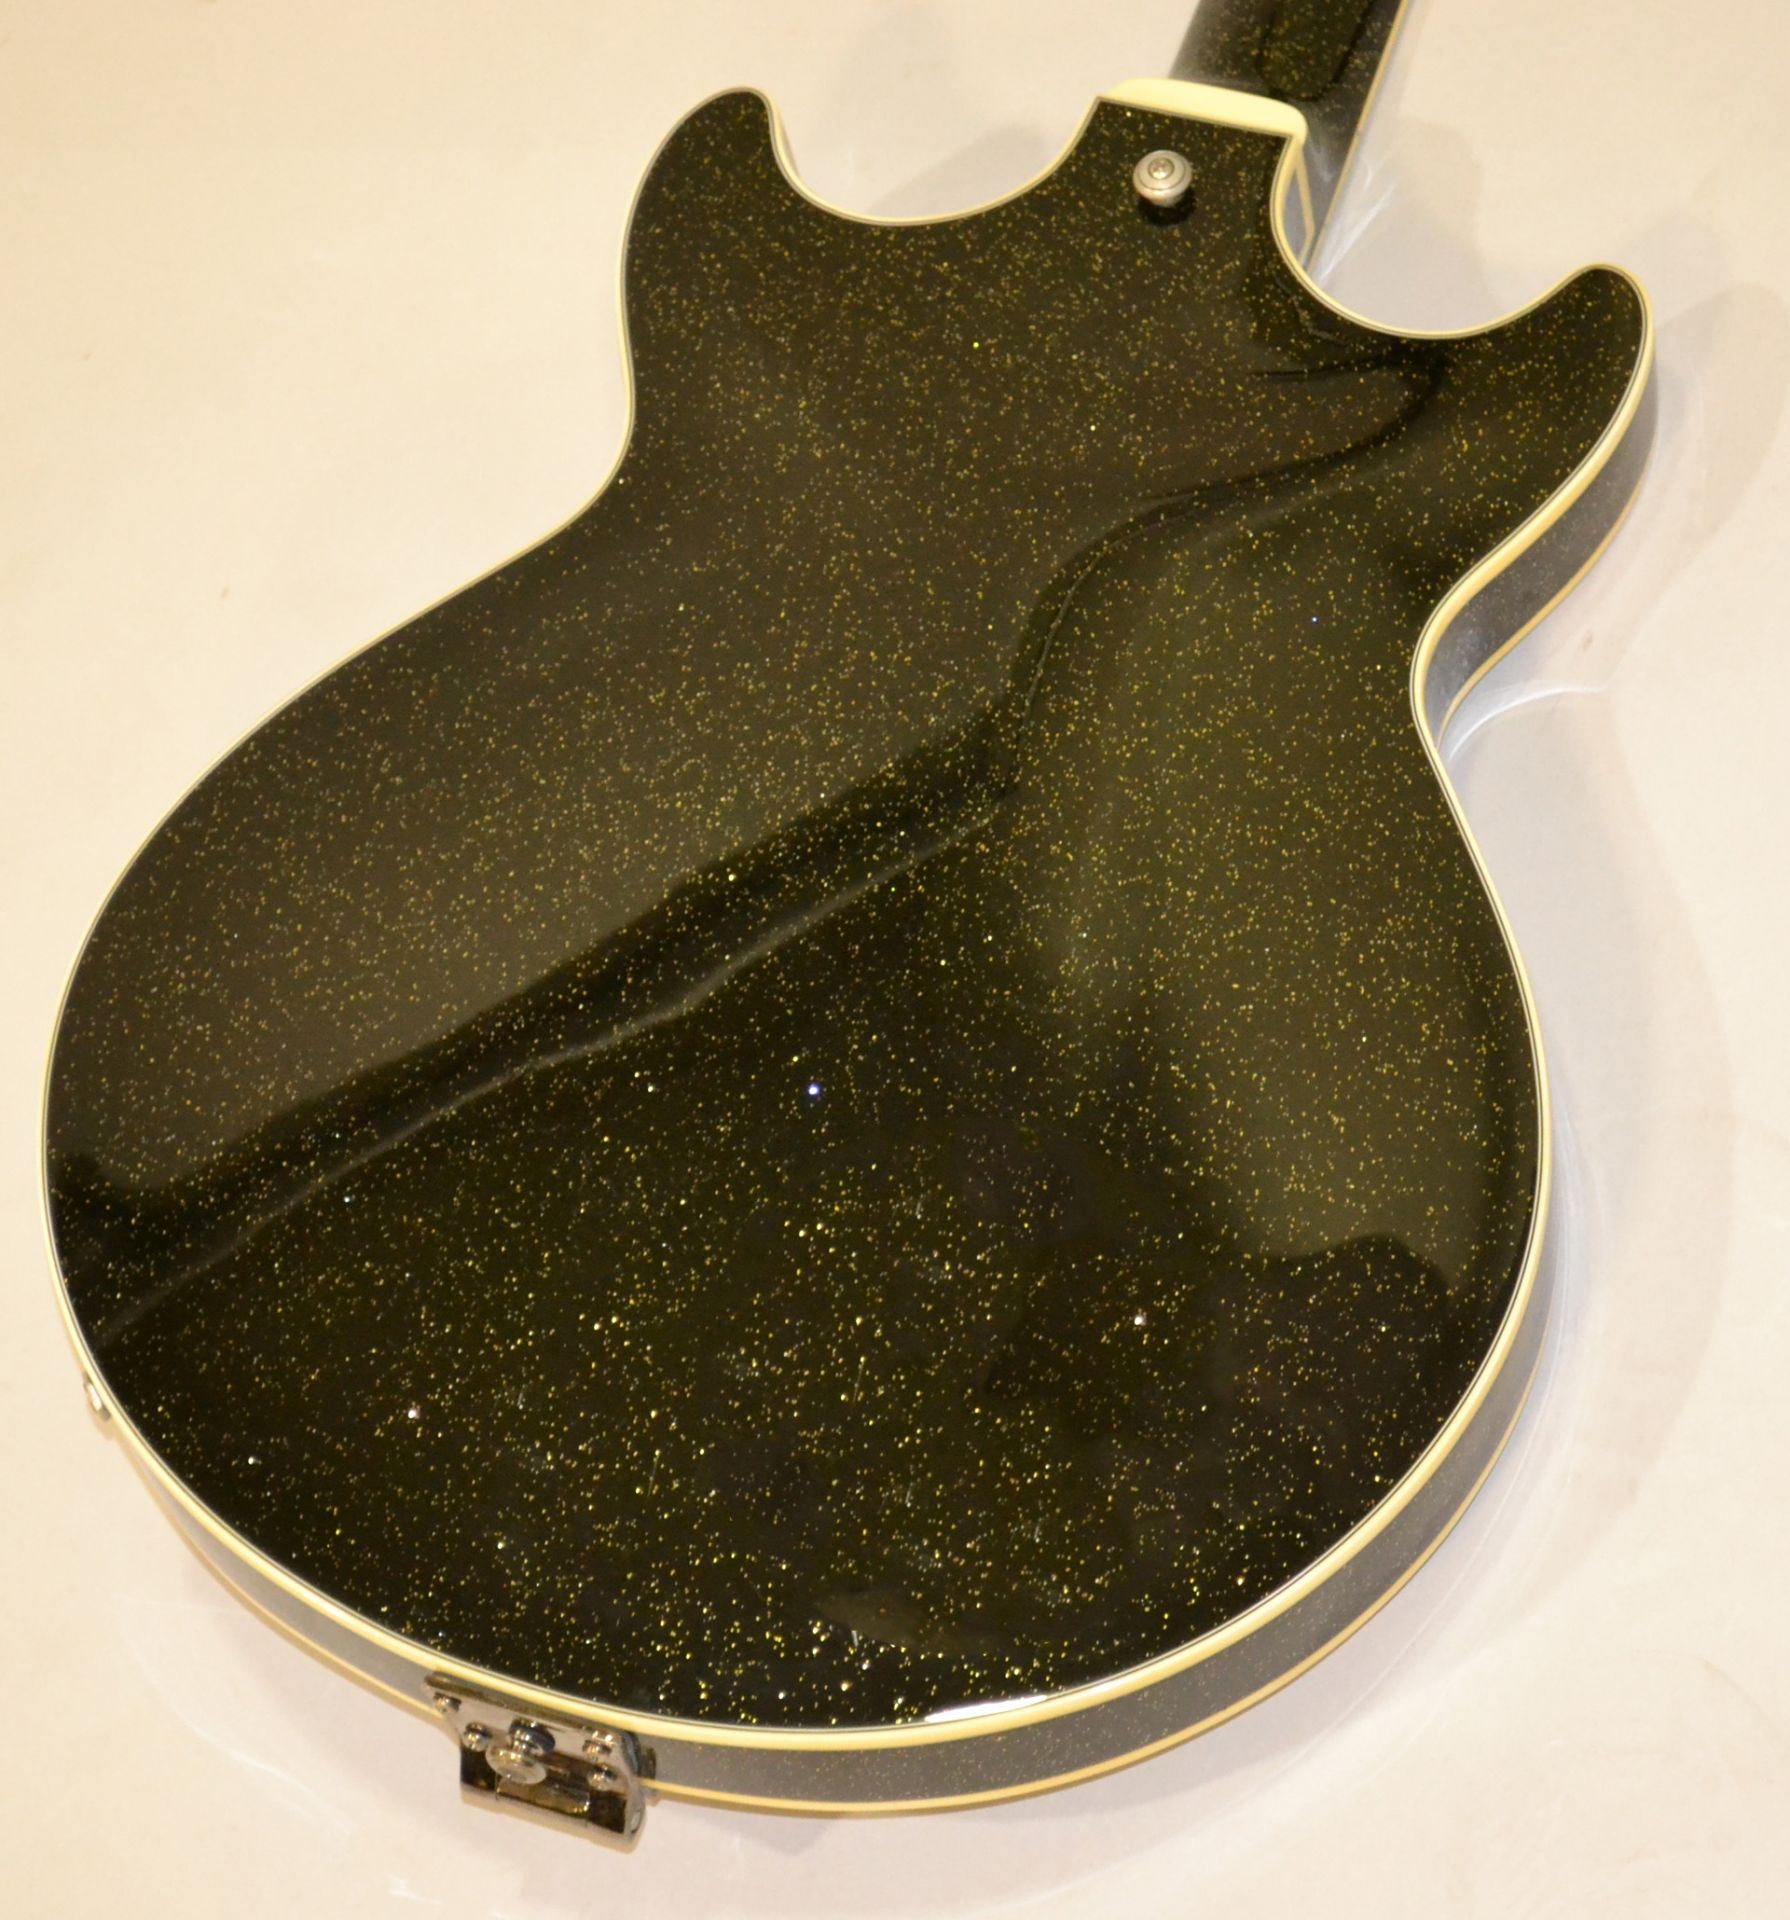 AM-78T Nebula Black SN:S12063223【海外限定モデル】の全体画像(縦)